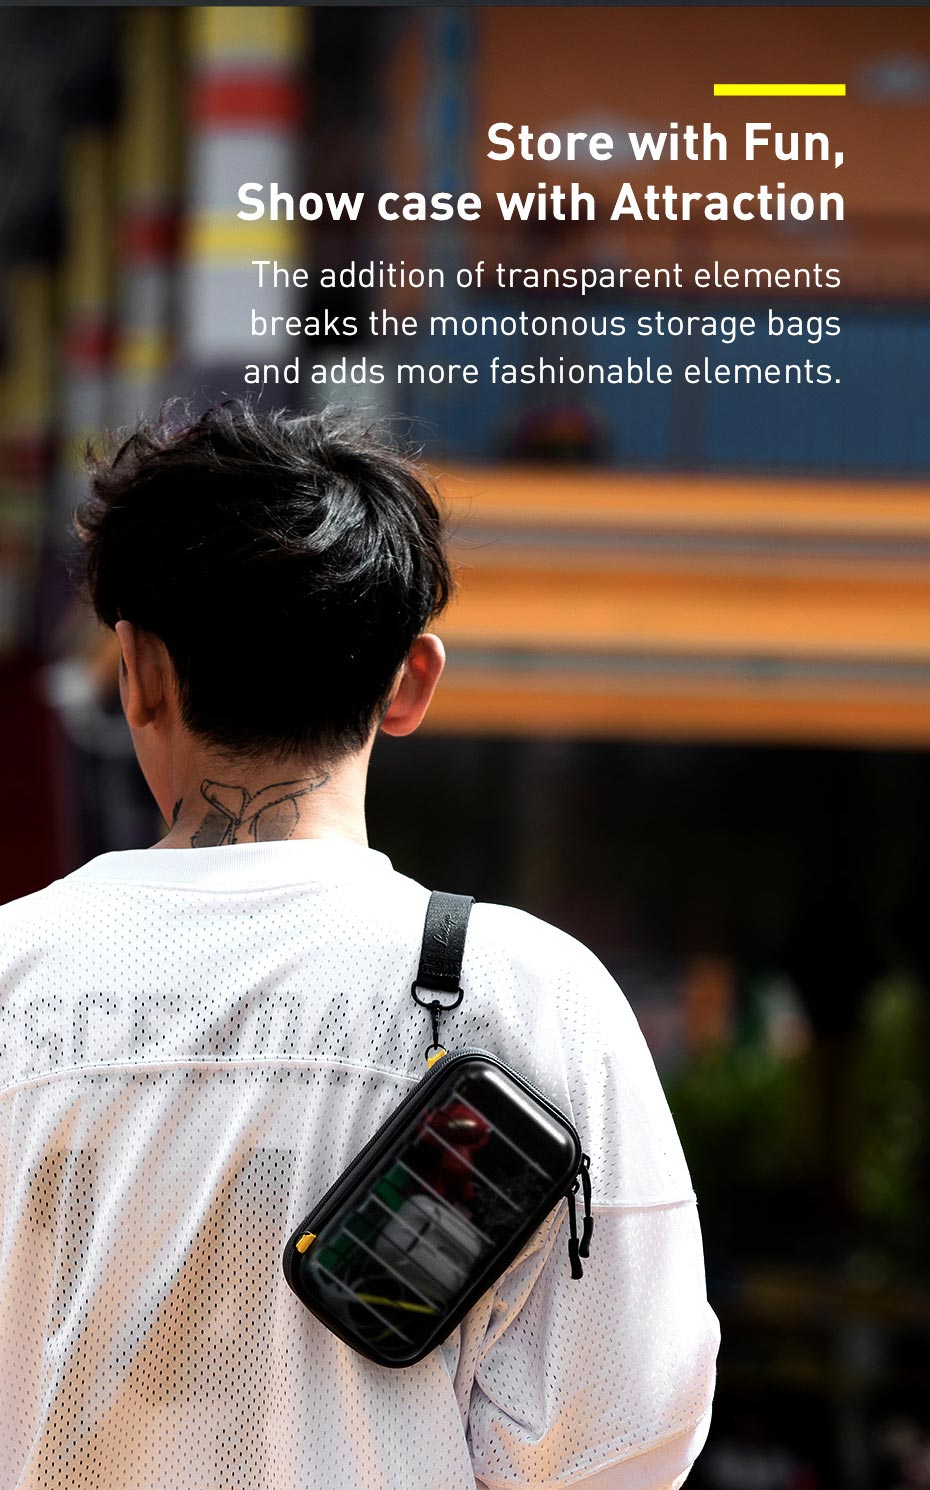 Baseus Hermit Shockproof Storage Bag 6